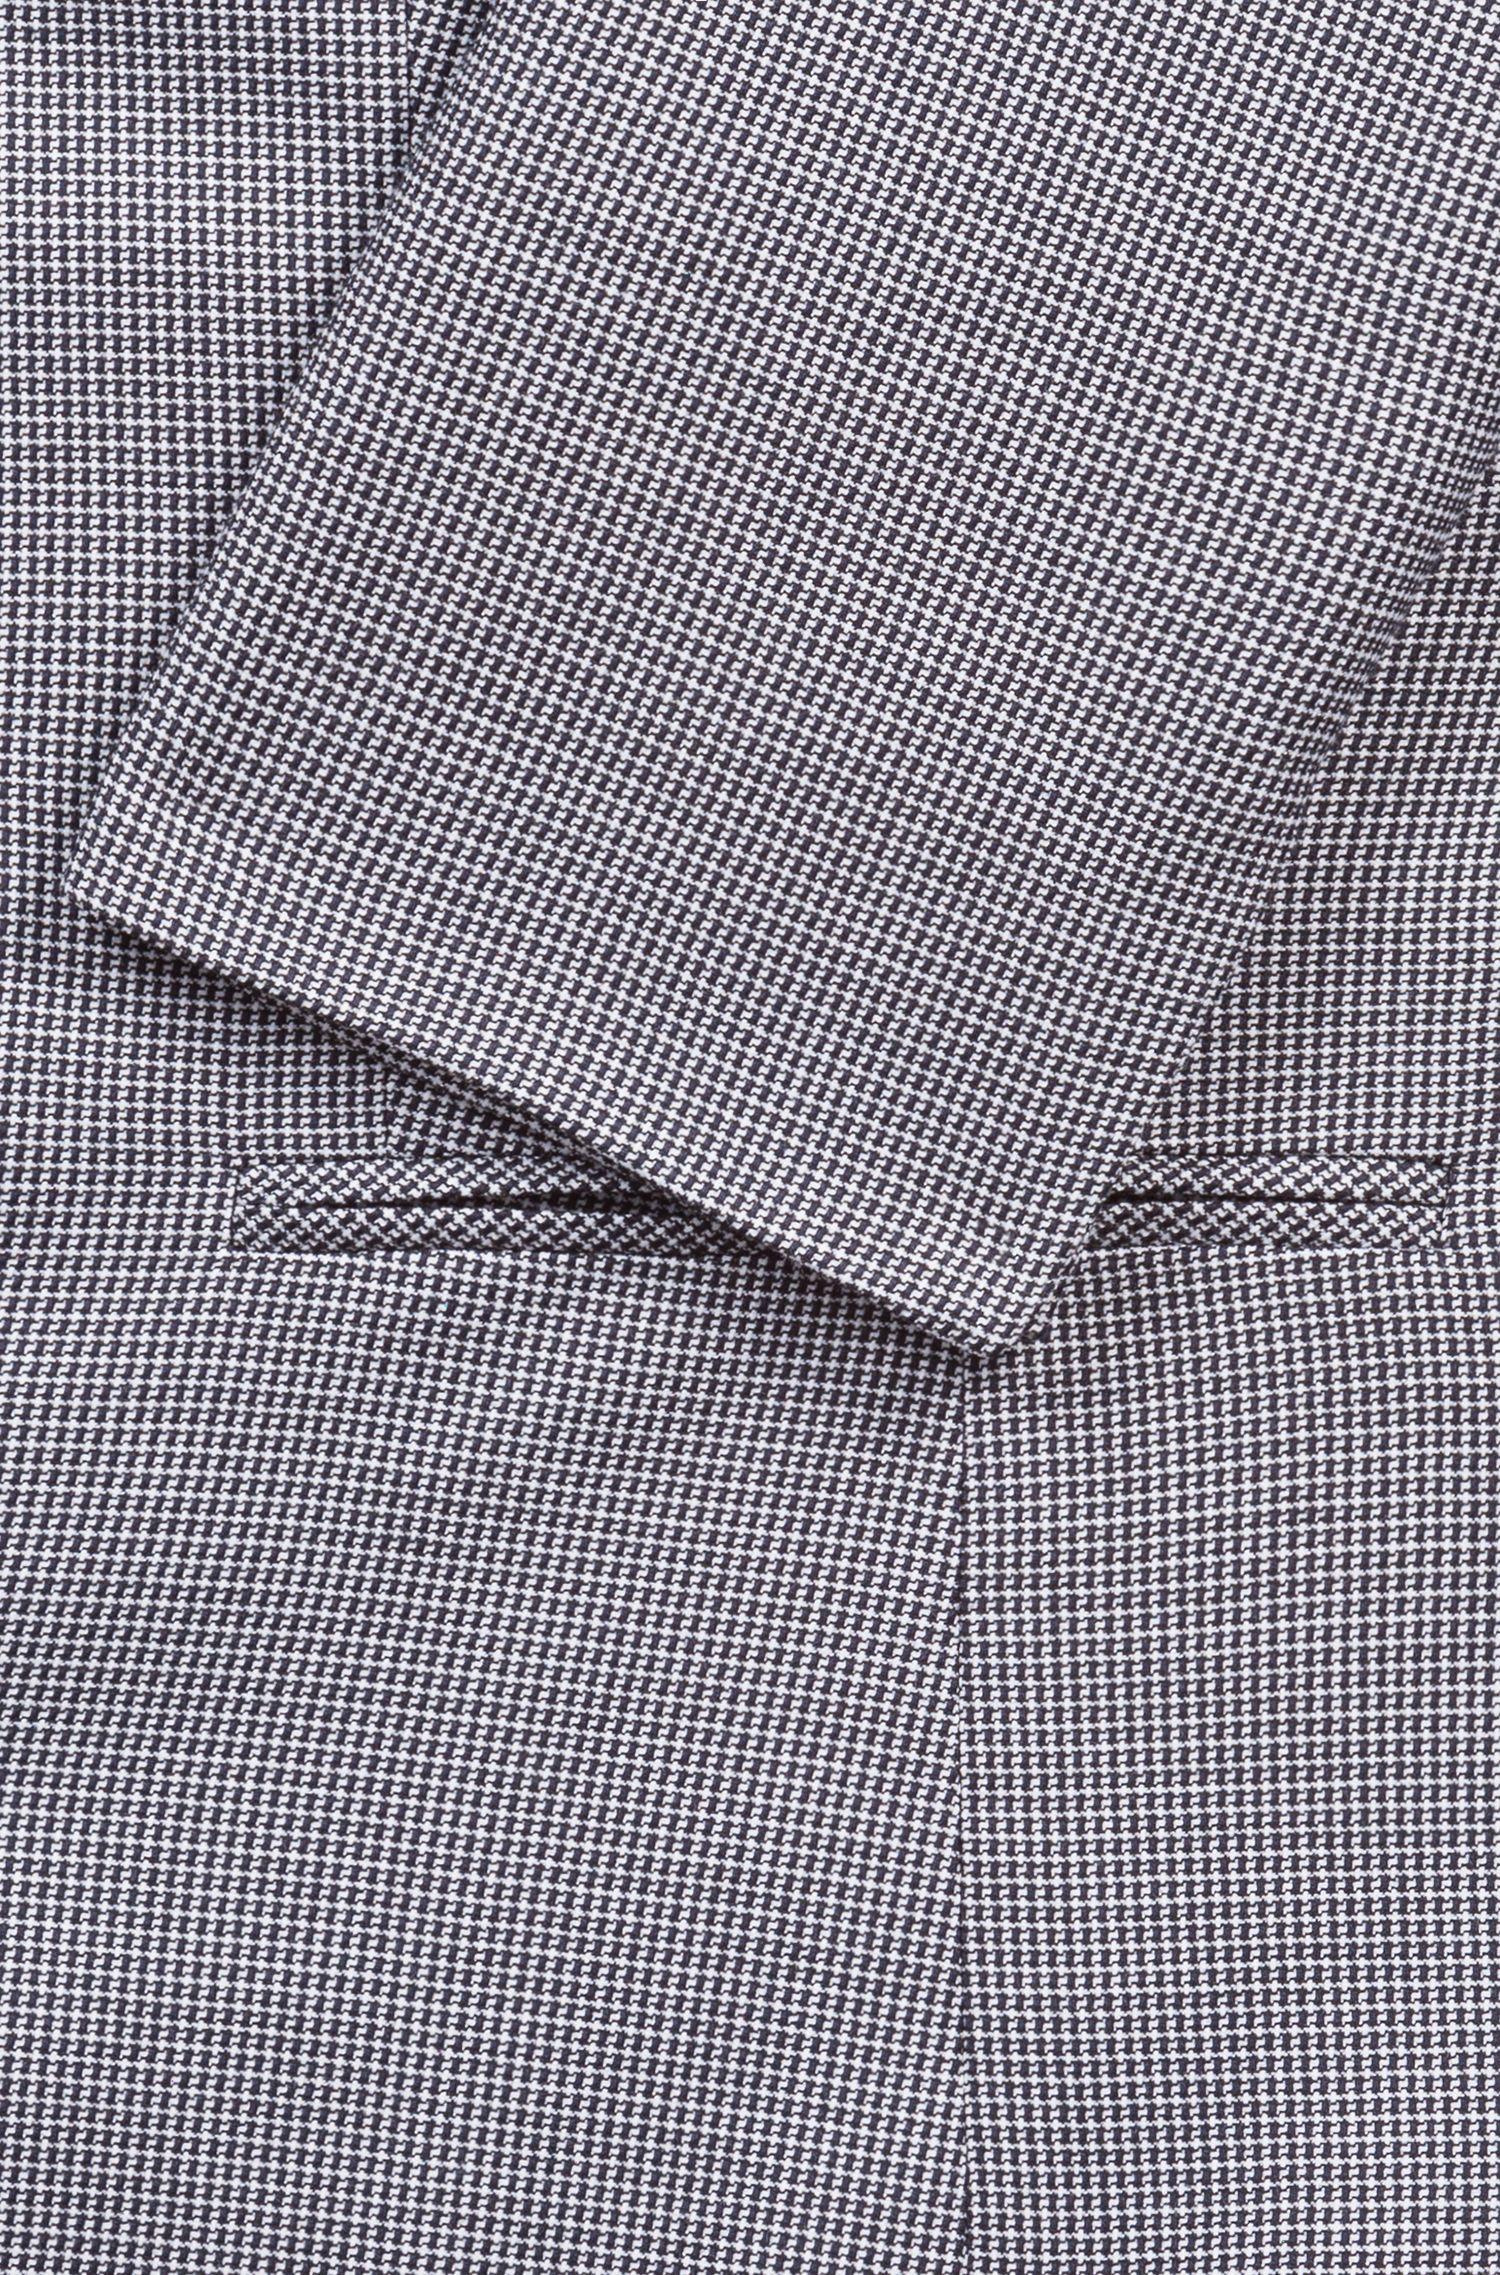 Veste 1bouton en tissu stretch à motif, Fantaisie